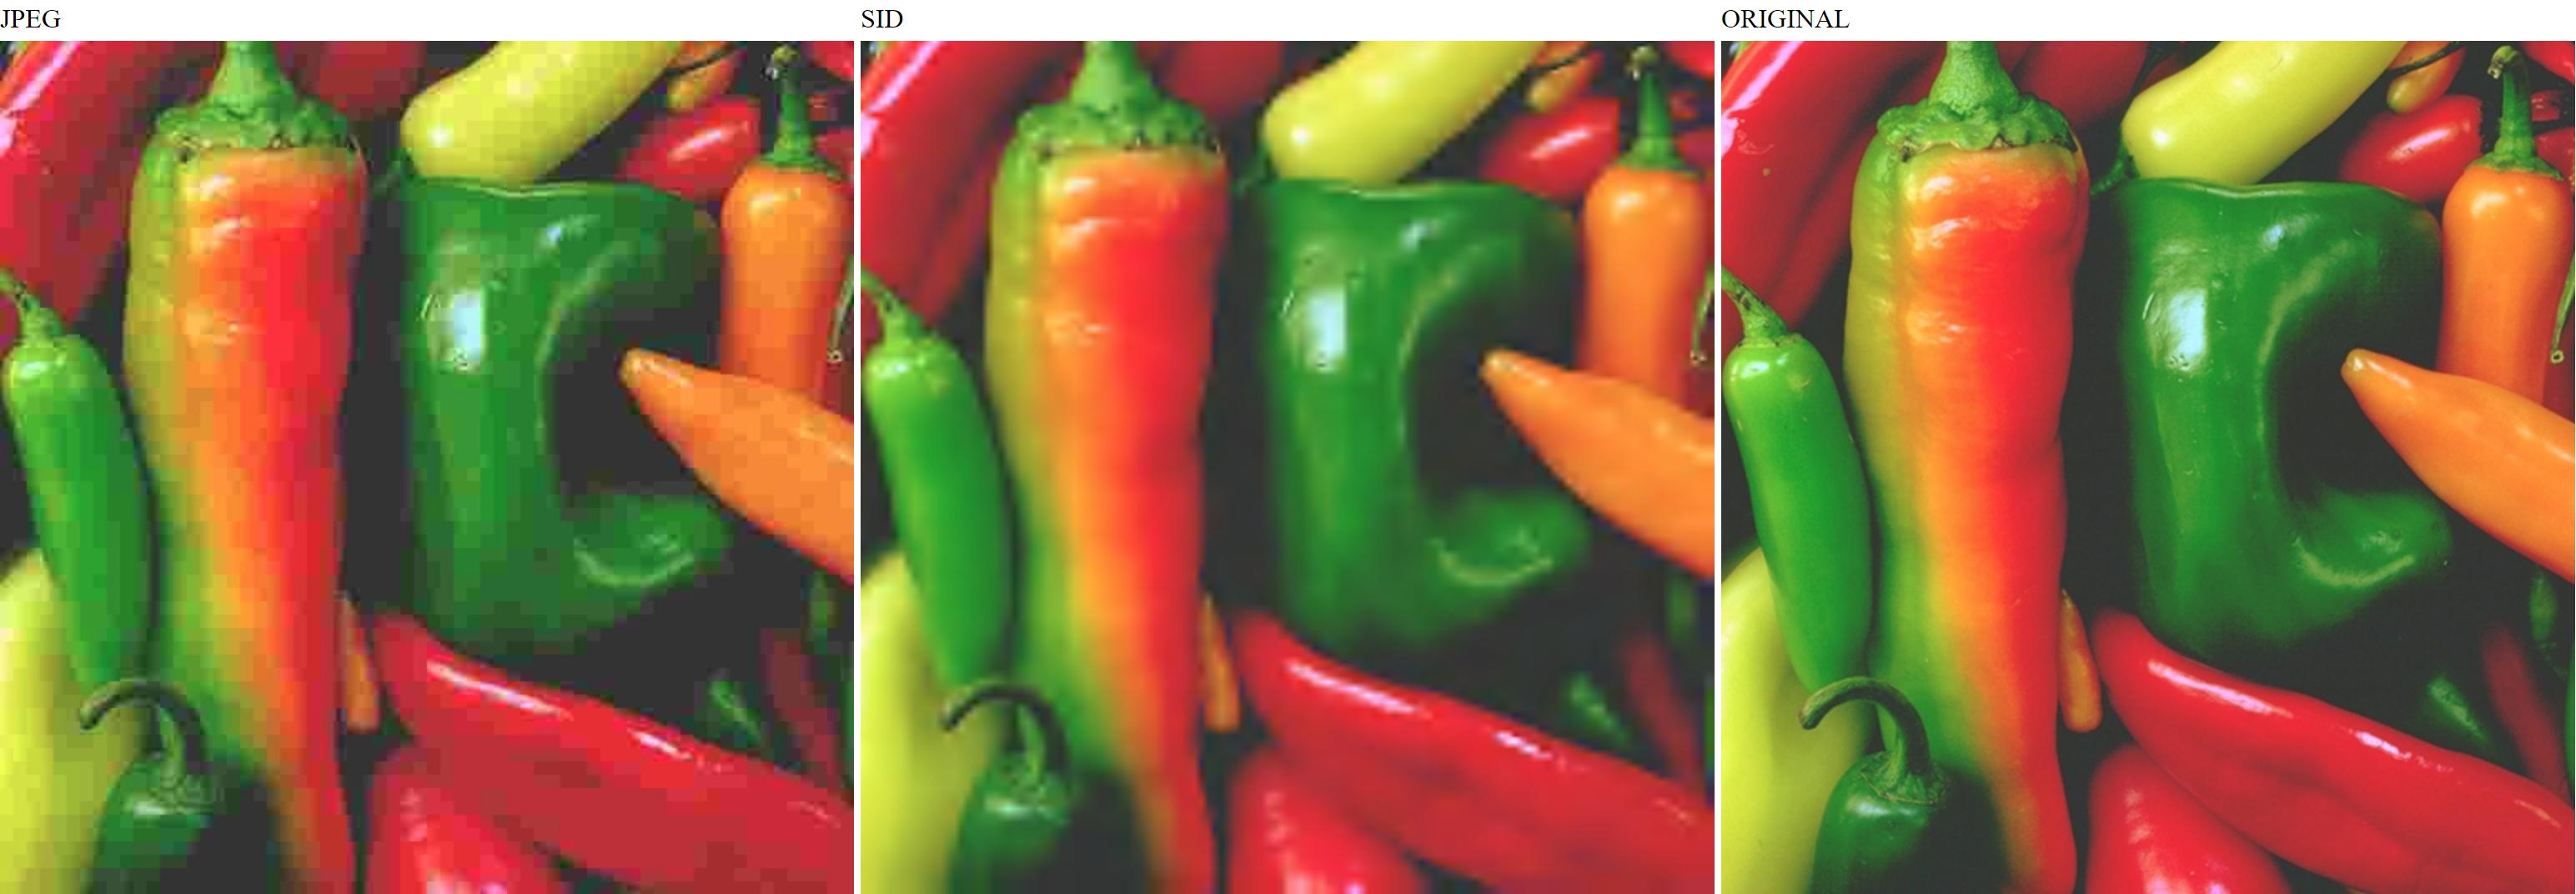 MrSIDvsJPEG_ImageComparison